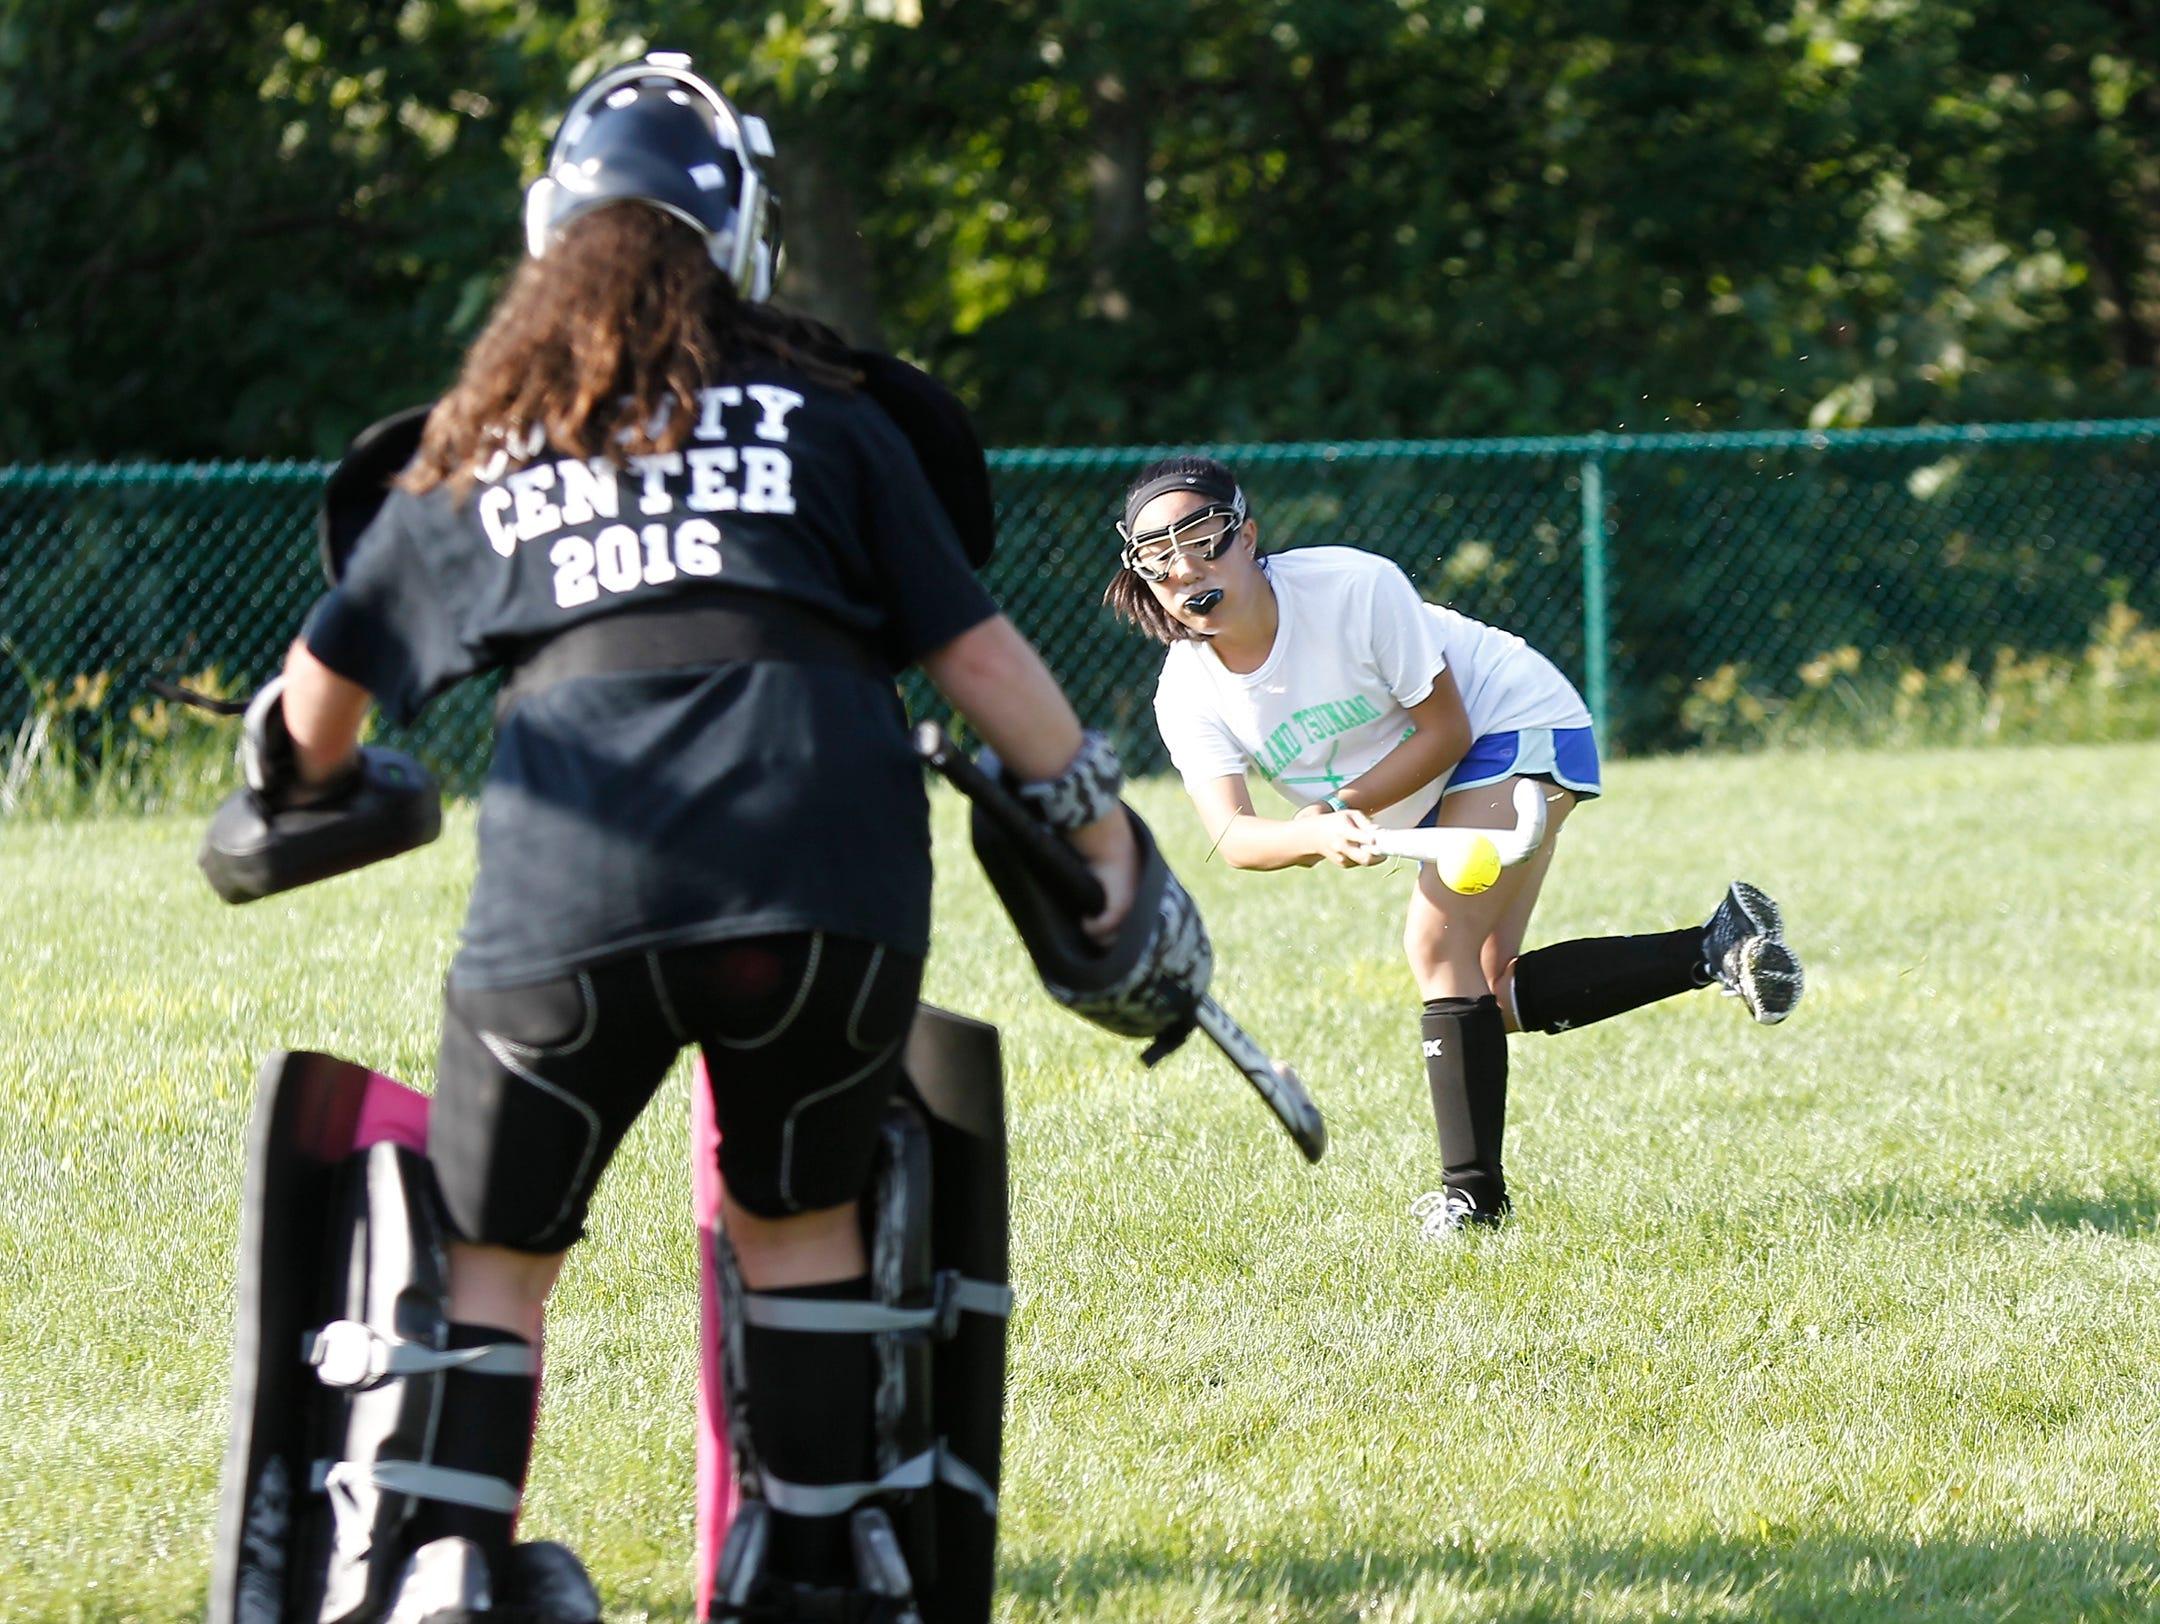 Nanuet's Jes Klebek fires a shot on goal during field hockey practice at Nanuet High School in Nanuet on Thursday.